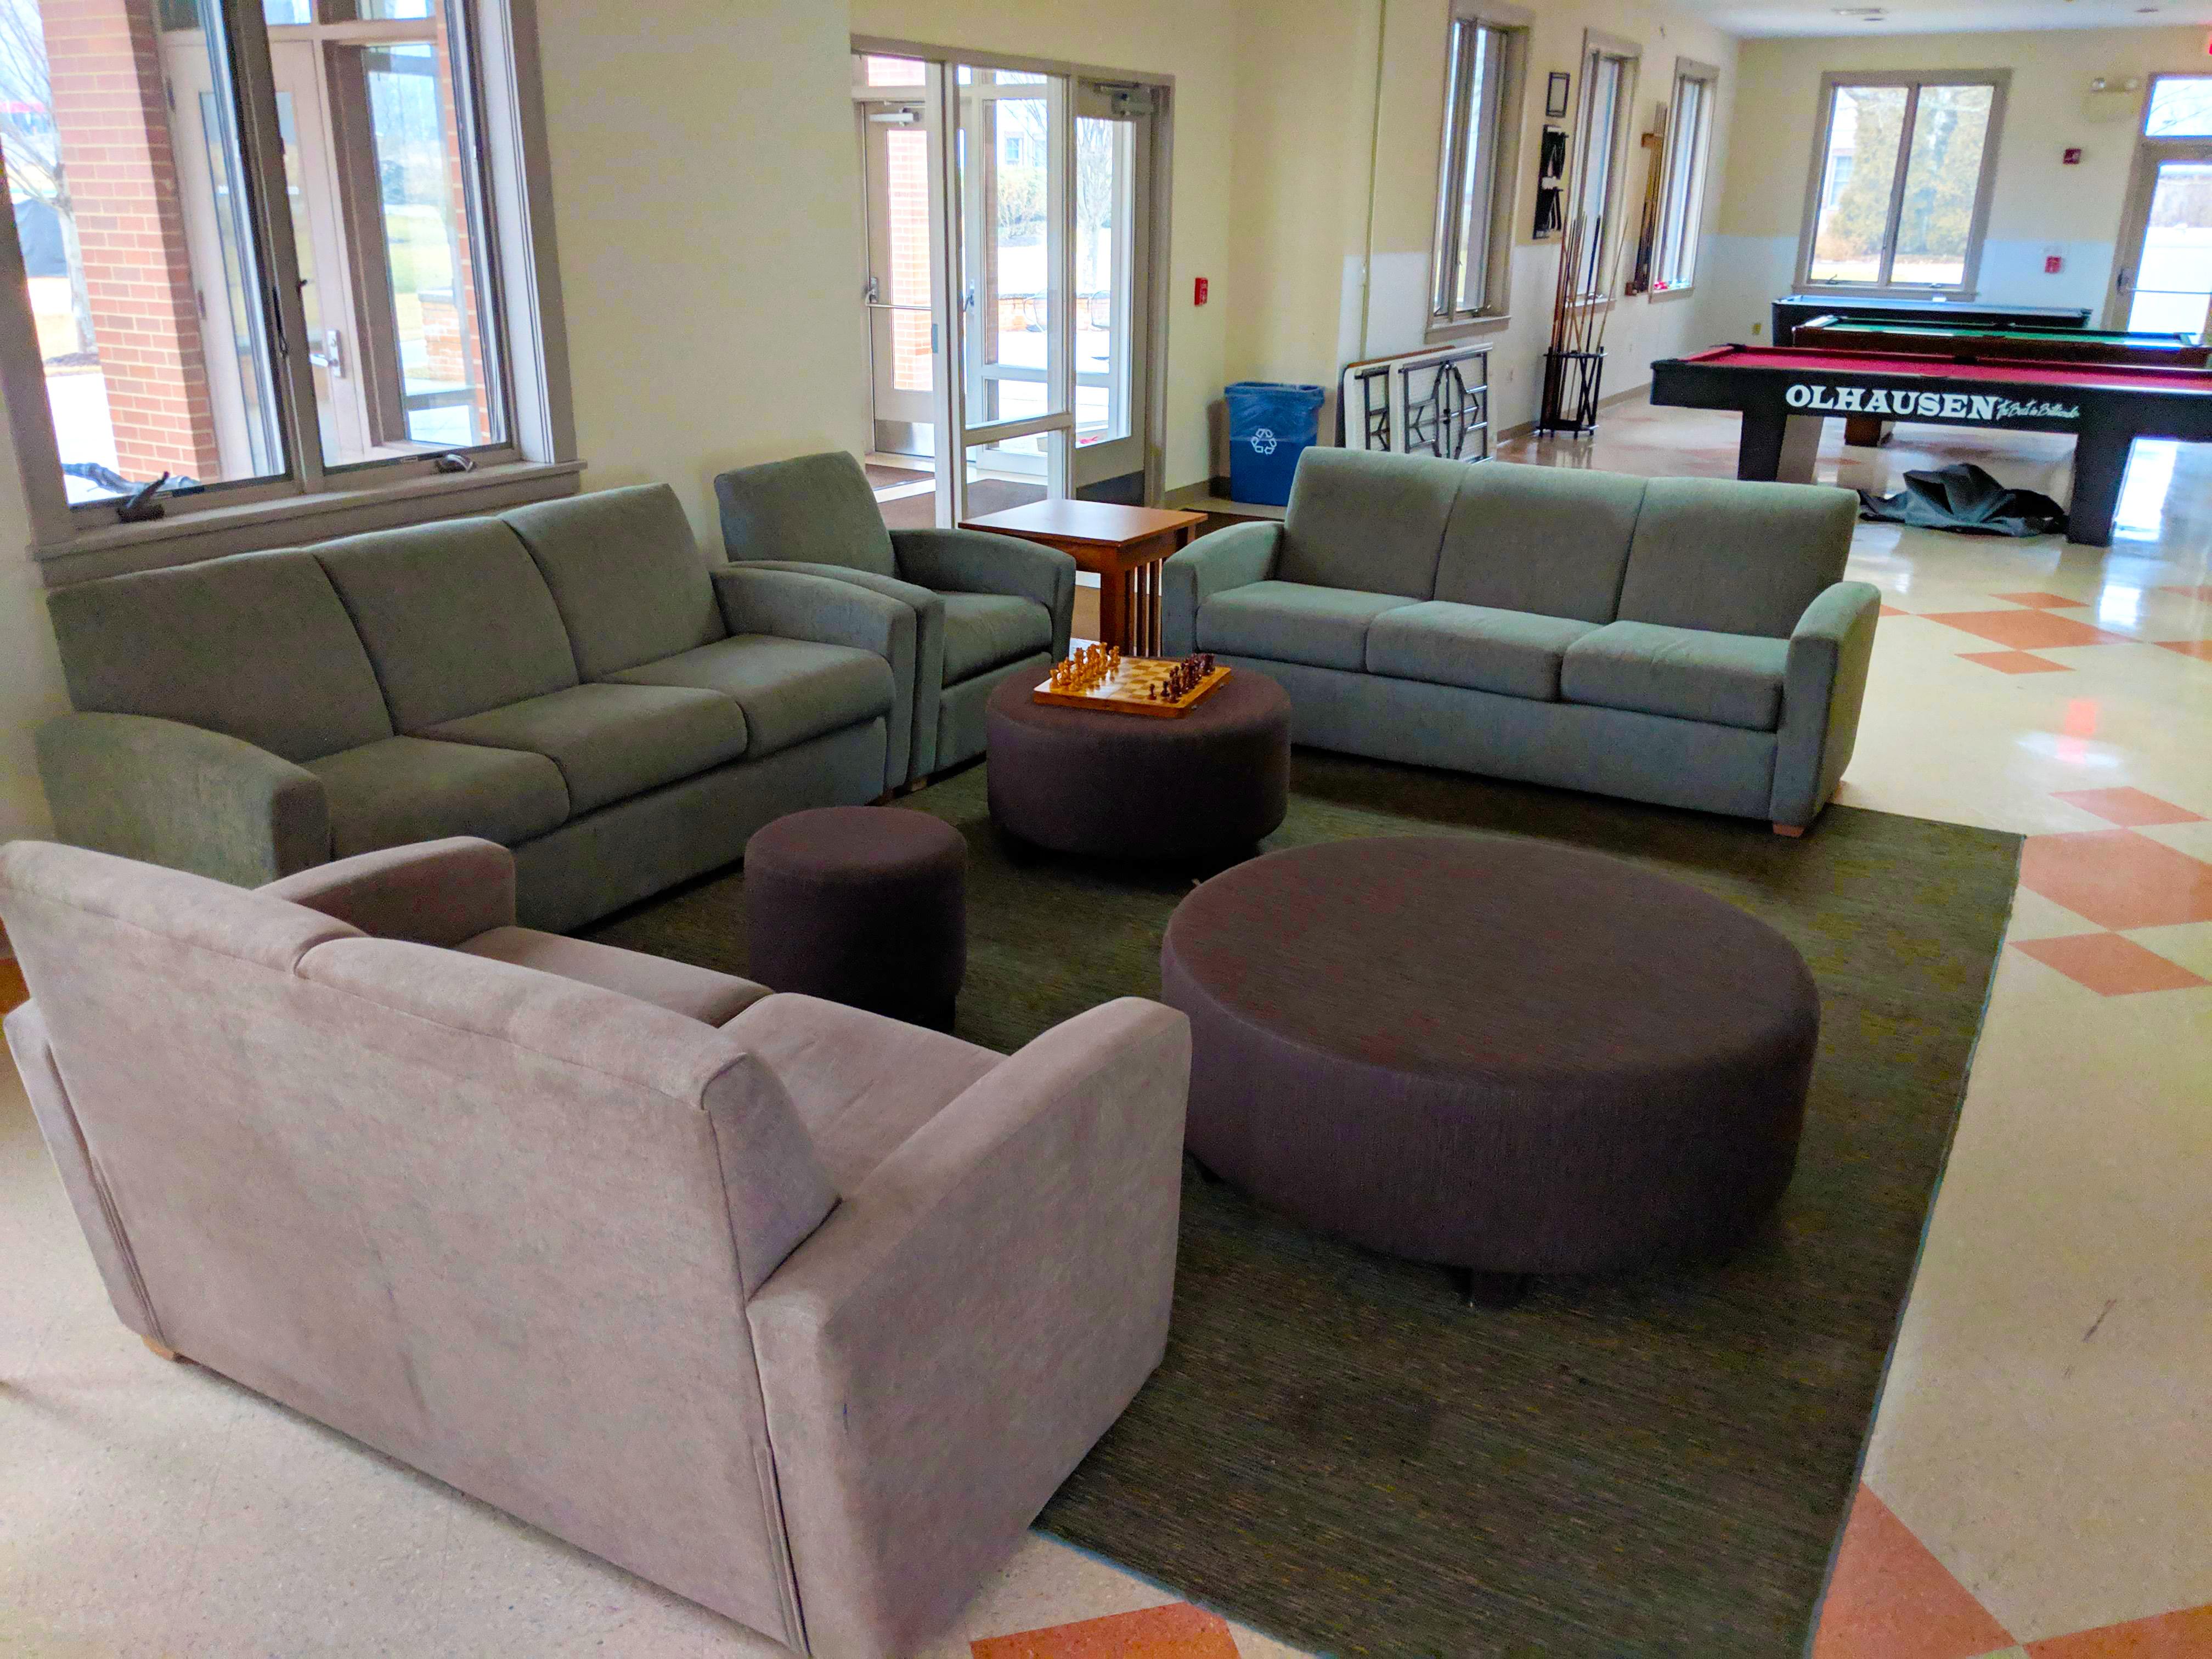 Childs Hall lounge